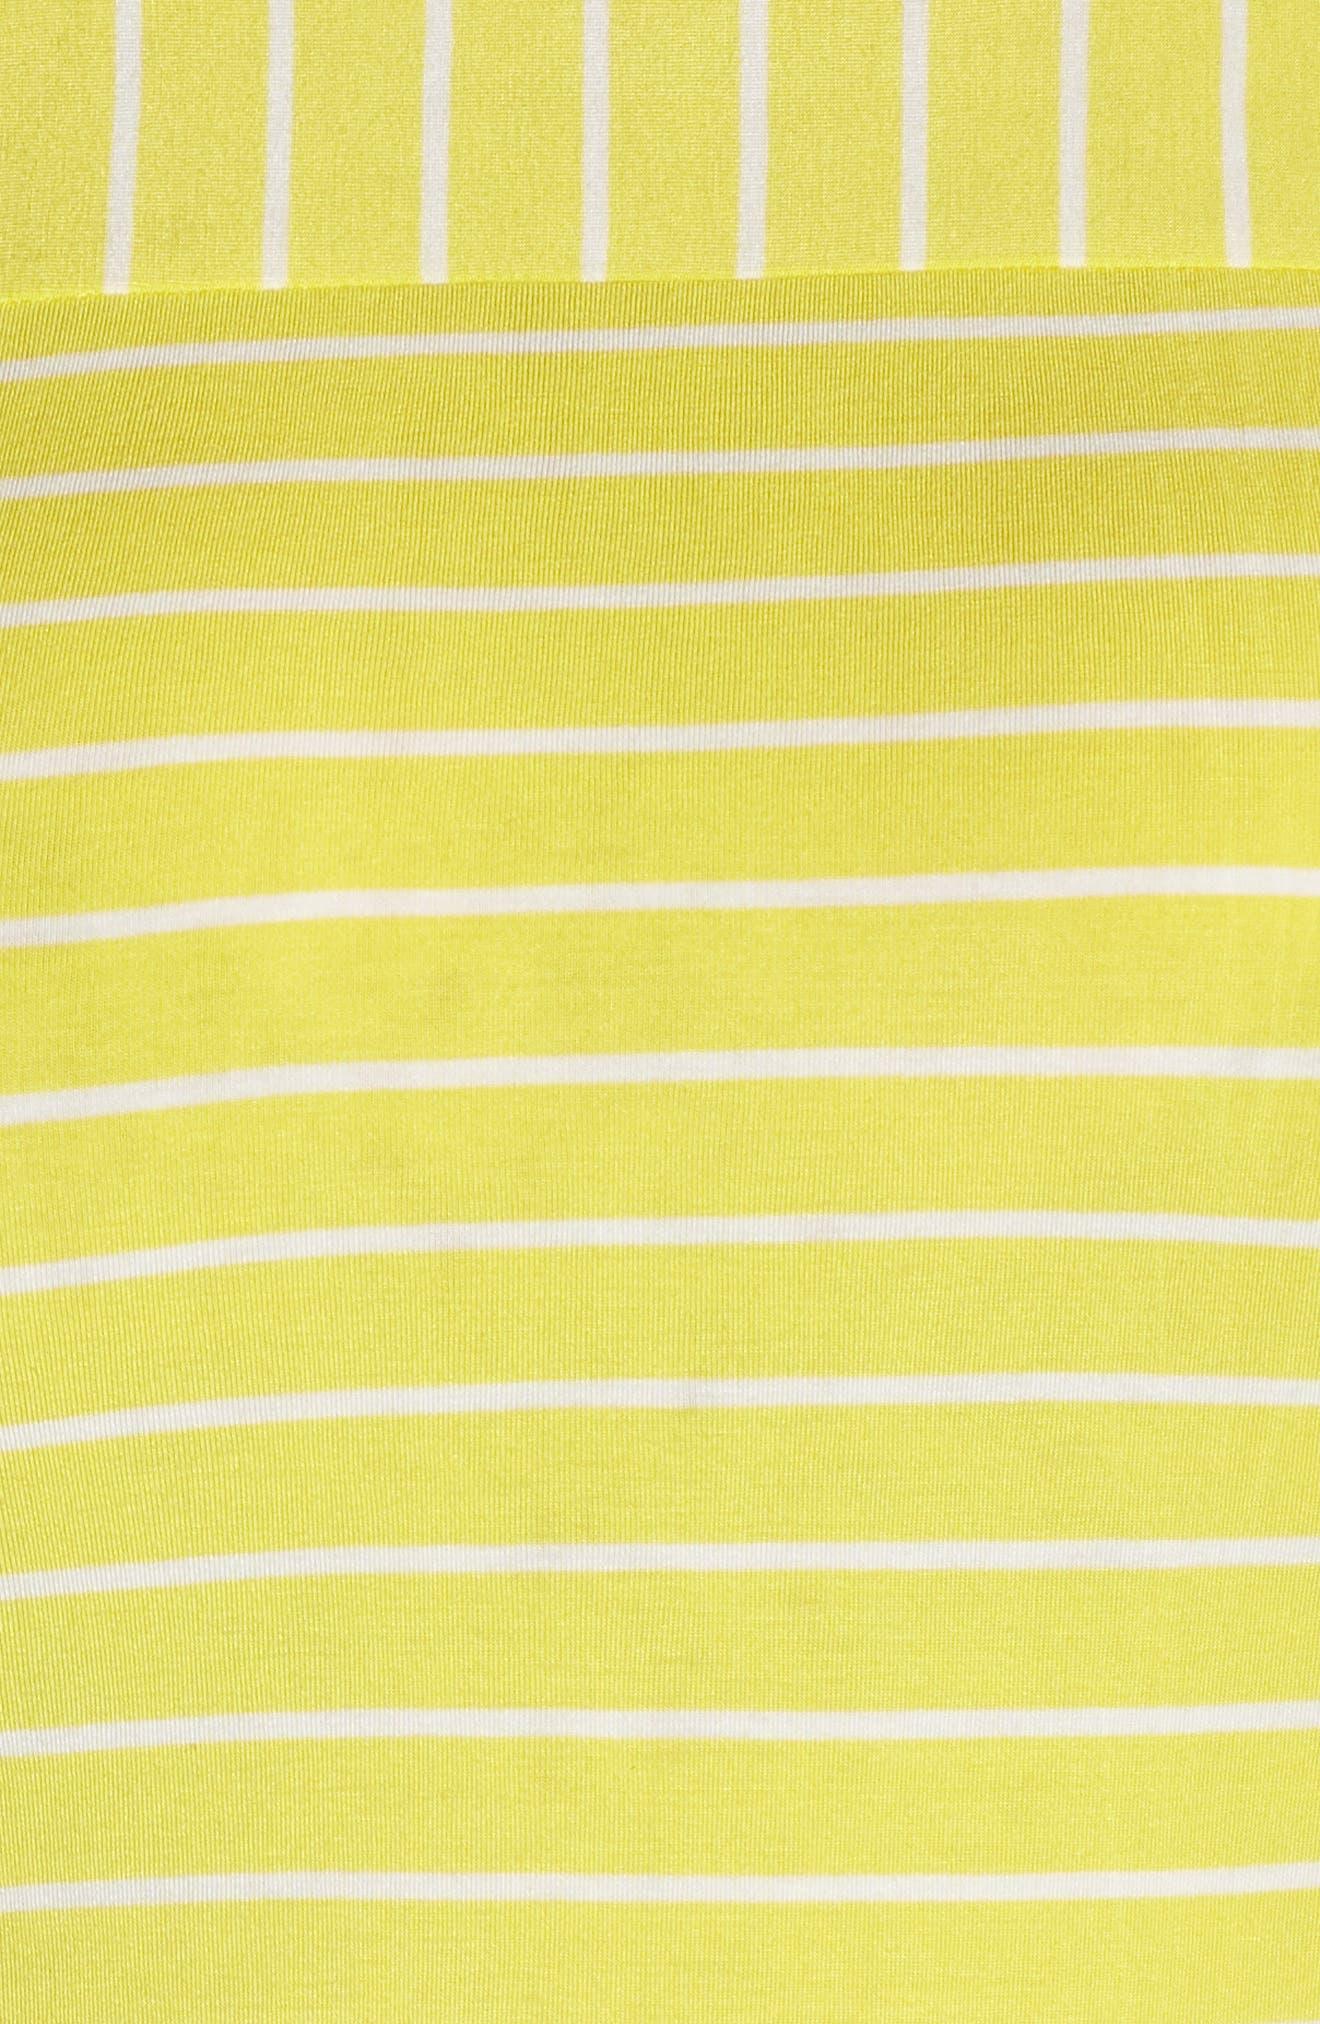 SEJOUR, Stripe Long Sleeve Tee, Alternate thumbnail 5, color, YELLOW ANYA STRIPE